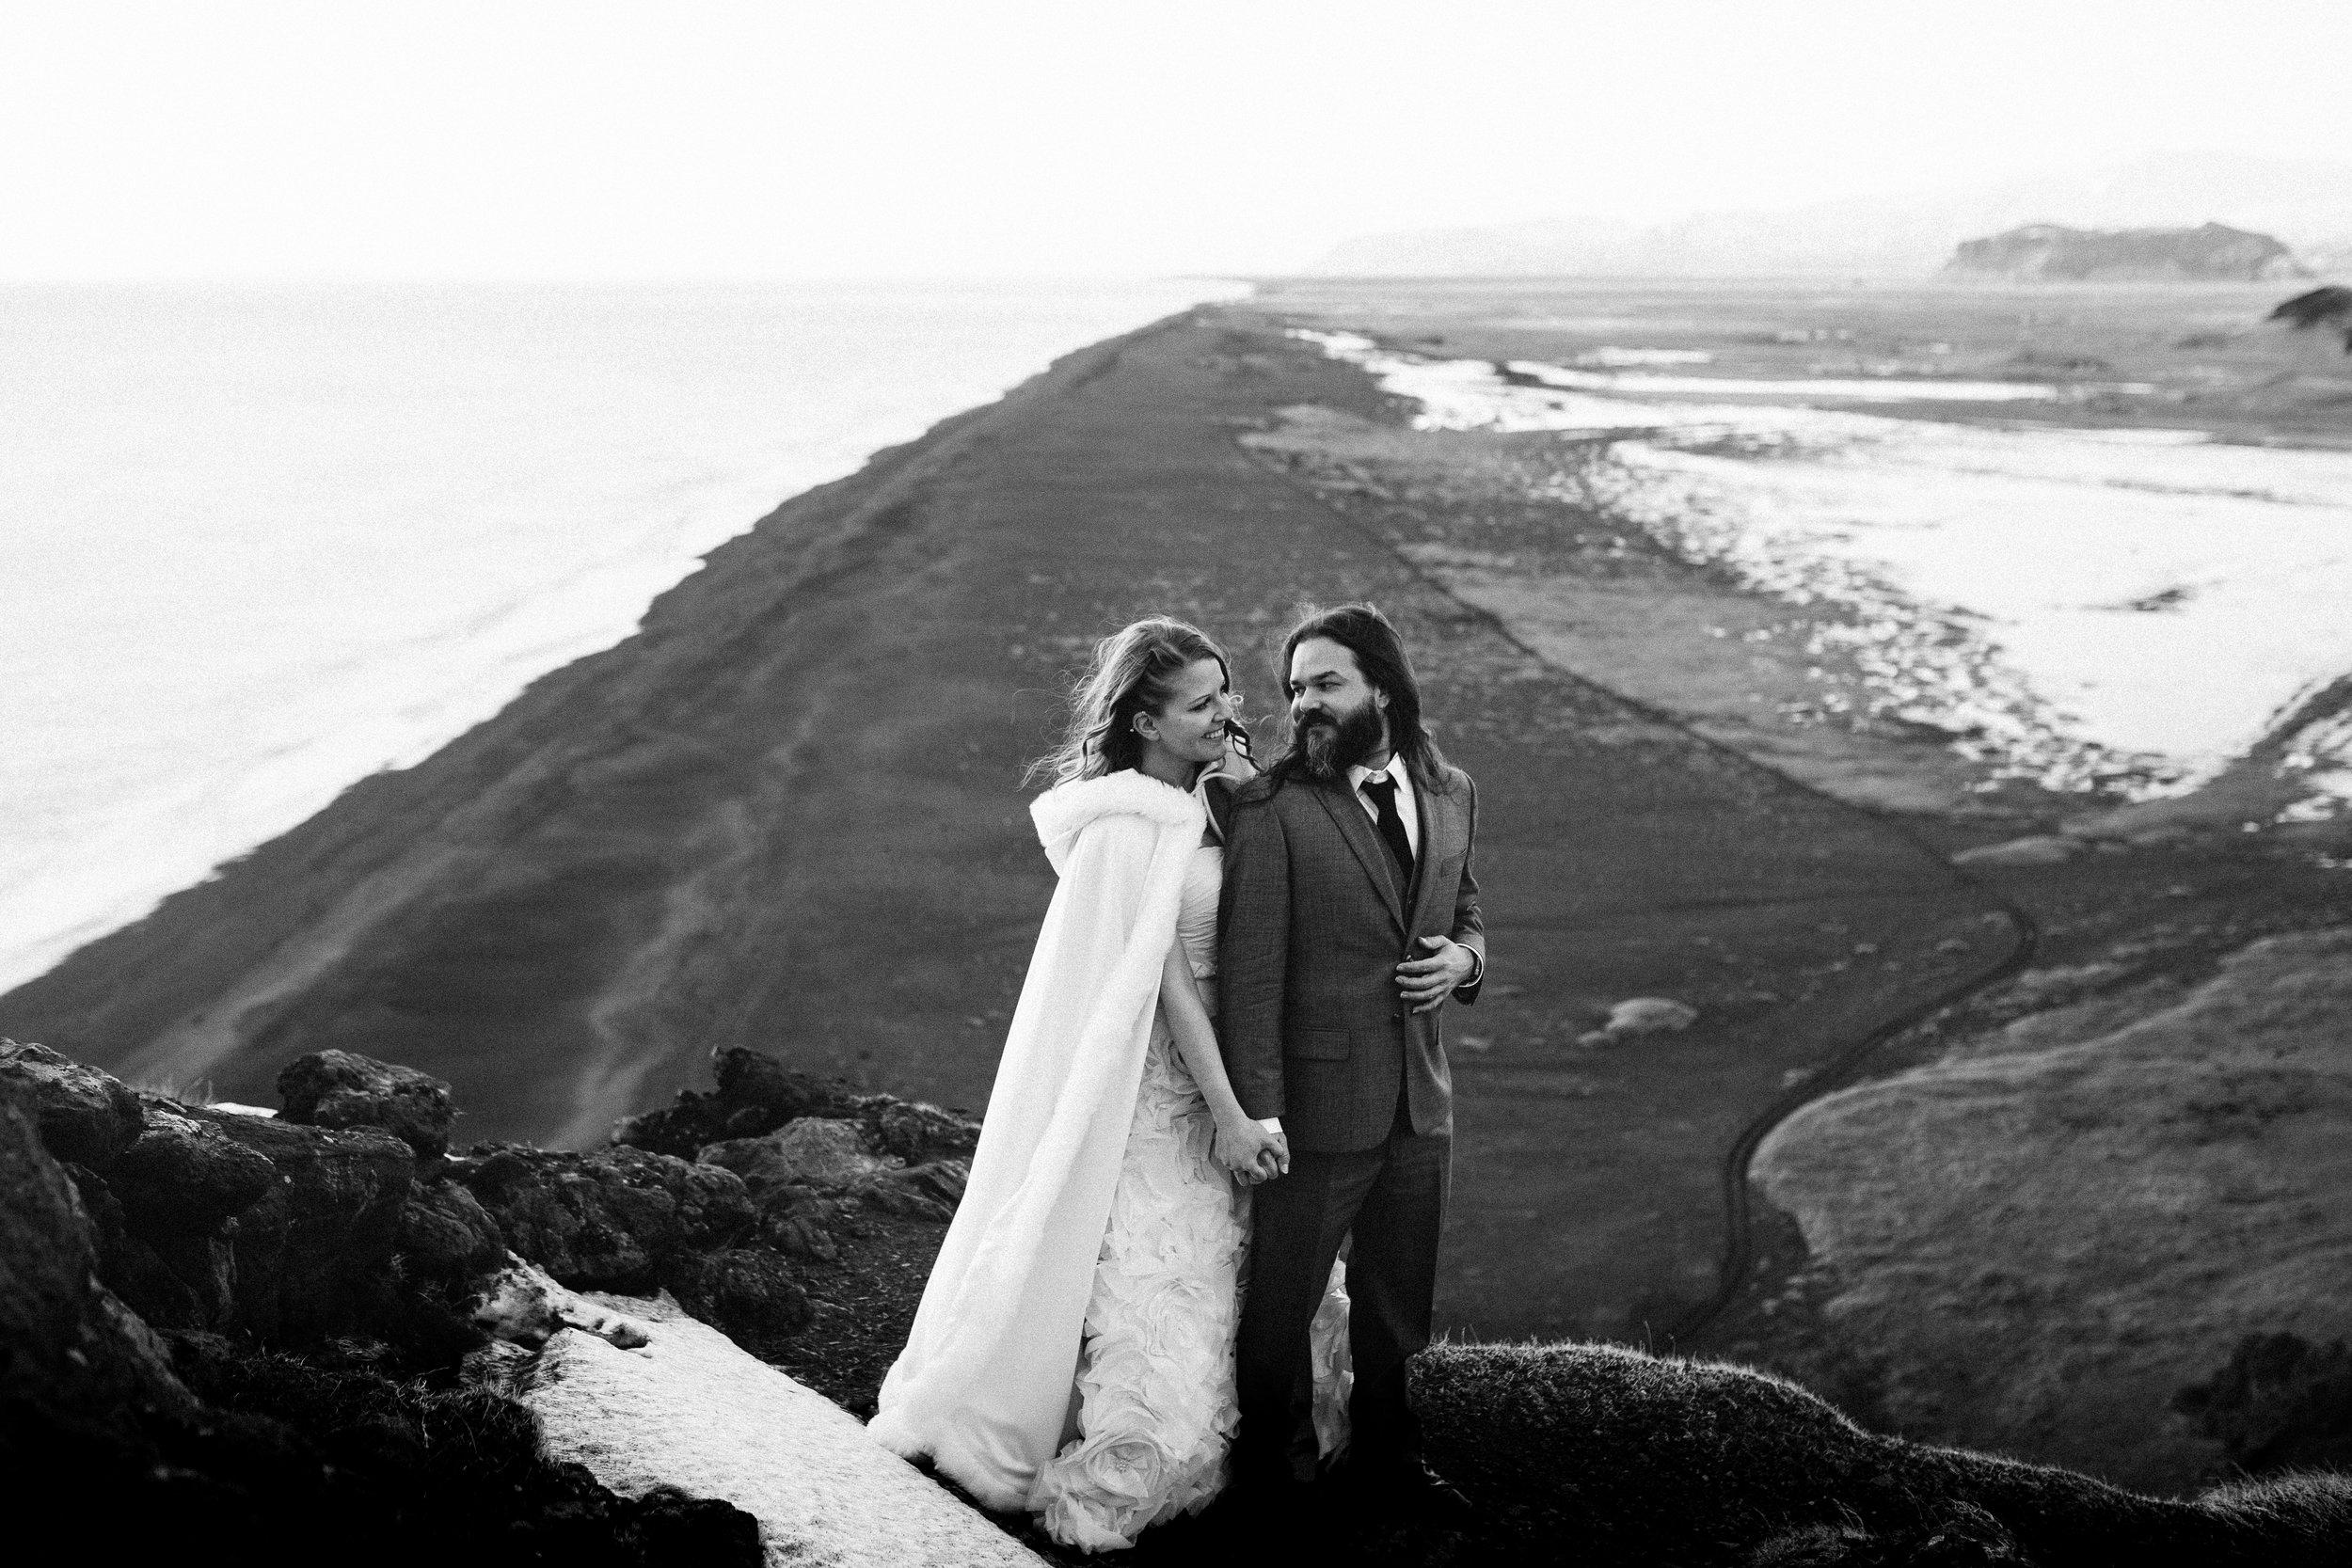 nicole-daacke-photography-iceland-winter-sunset-adventure-elopement-skogafoss-waterfall-black-sand-beach-dyrholaey-vik-iceland-intimate-wedding-black-church-elopement-photographer-41.jpg